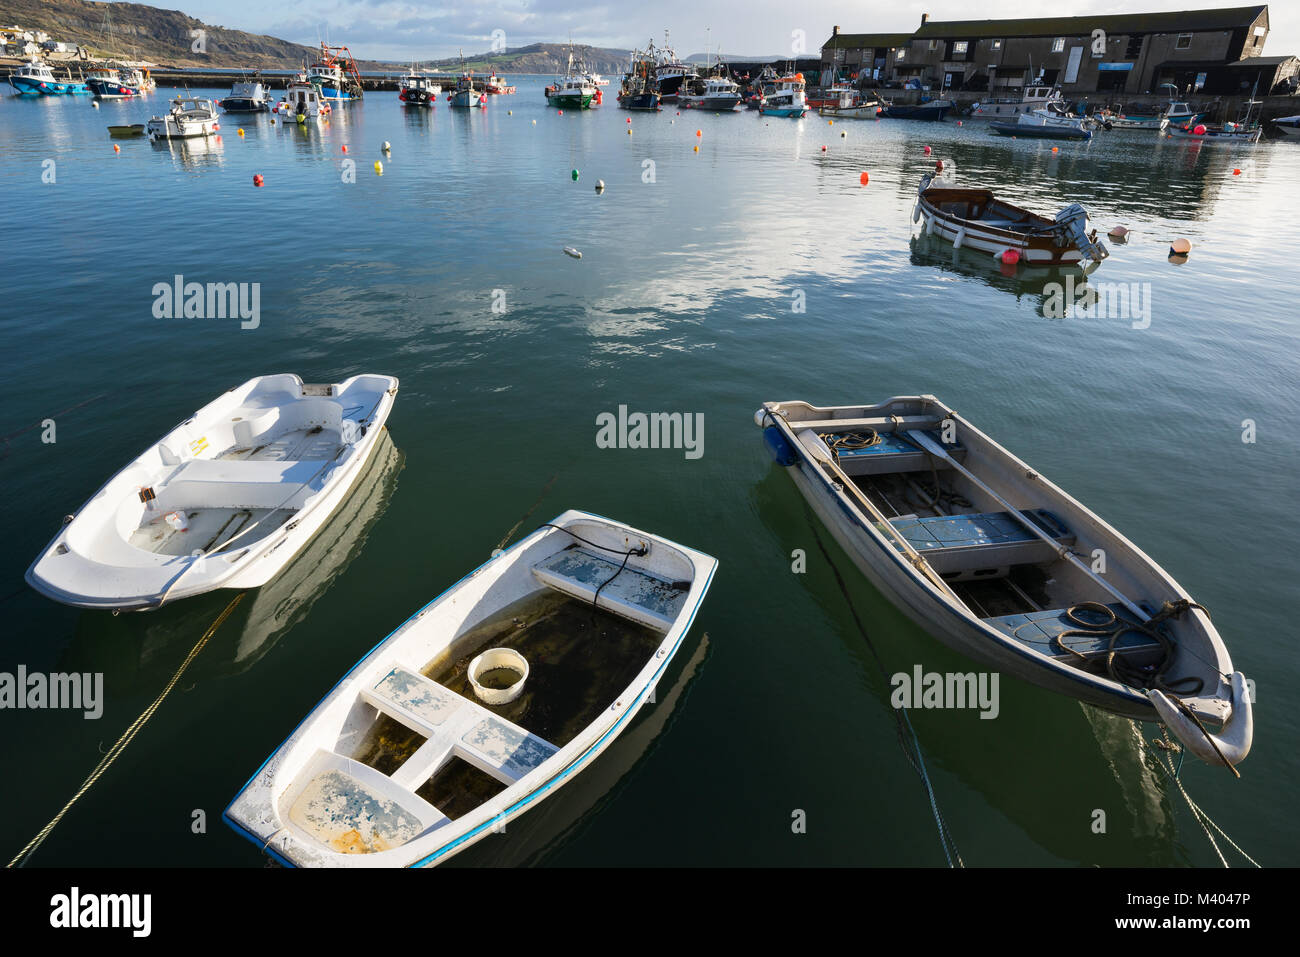 Lyme regis harbour in Dorset, wideangle. - Stock Image